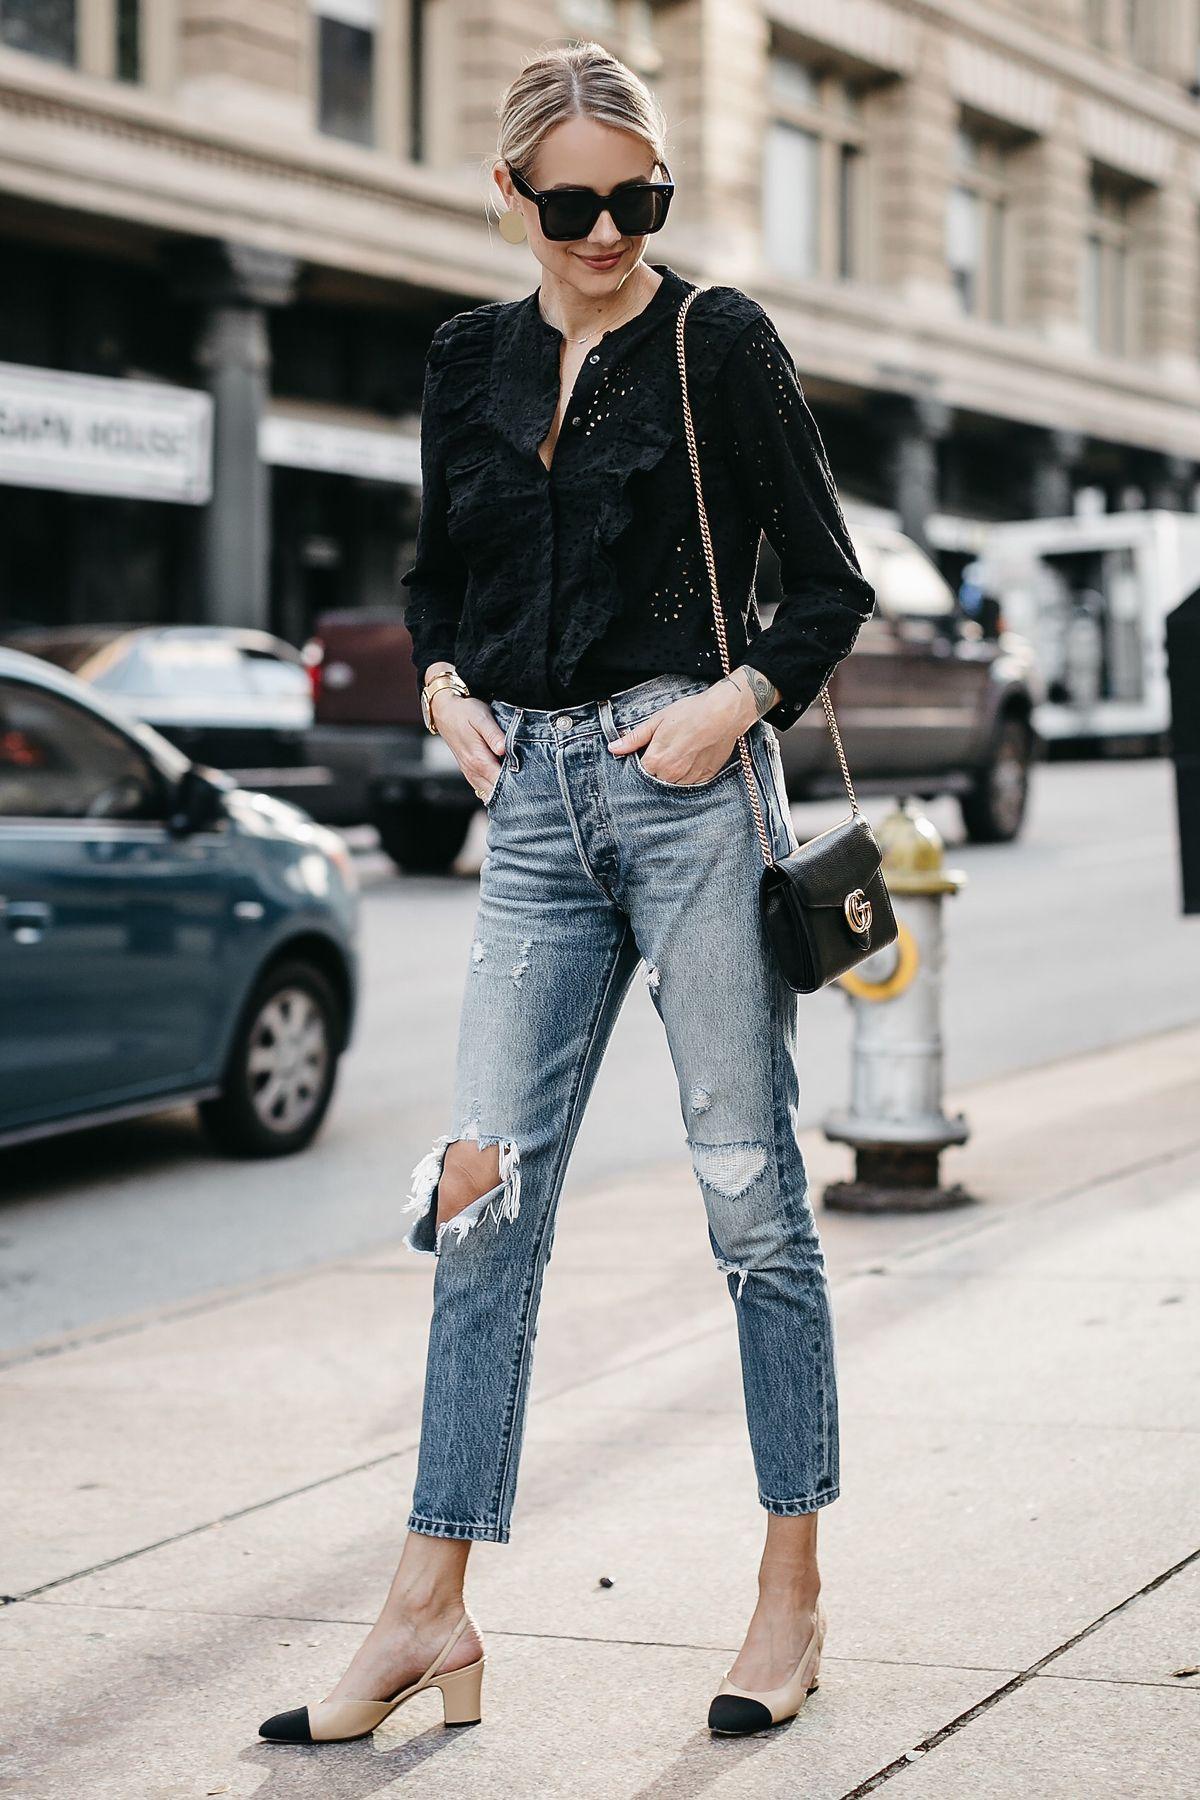 95748b9c Blonde Woman Wearing Madewell Black Eyelet Blouse Levis Denim Ripped Skinny  Jeans Chanel Slingbacks Gucci Marmont Handbag Fashion Jackson Dallas Blogger  ...